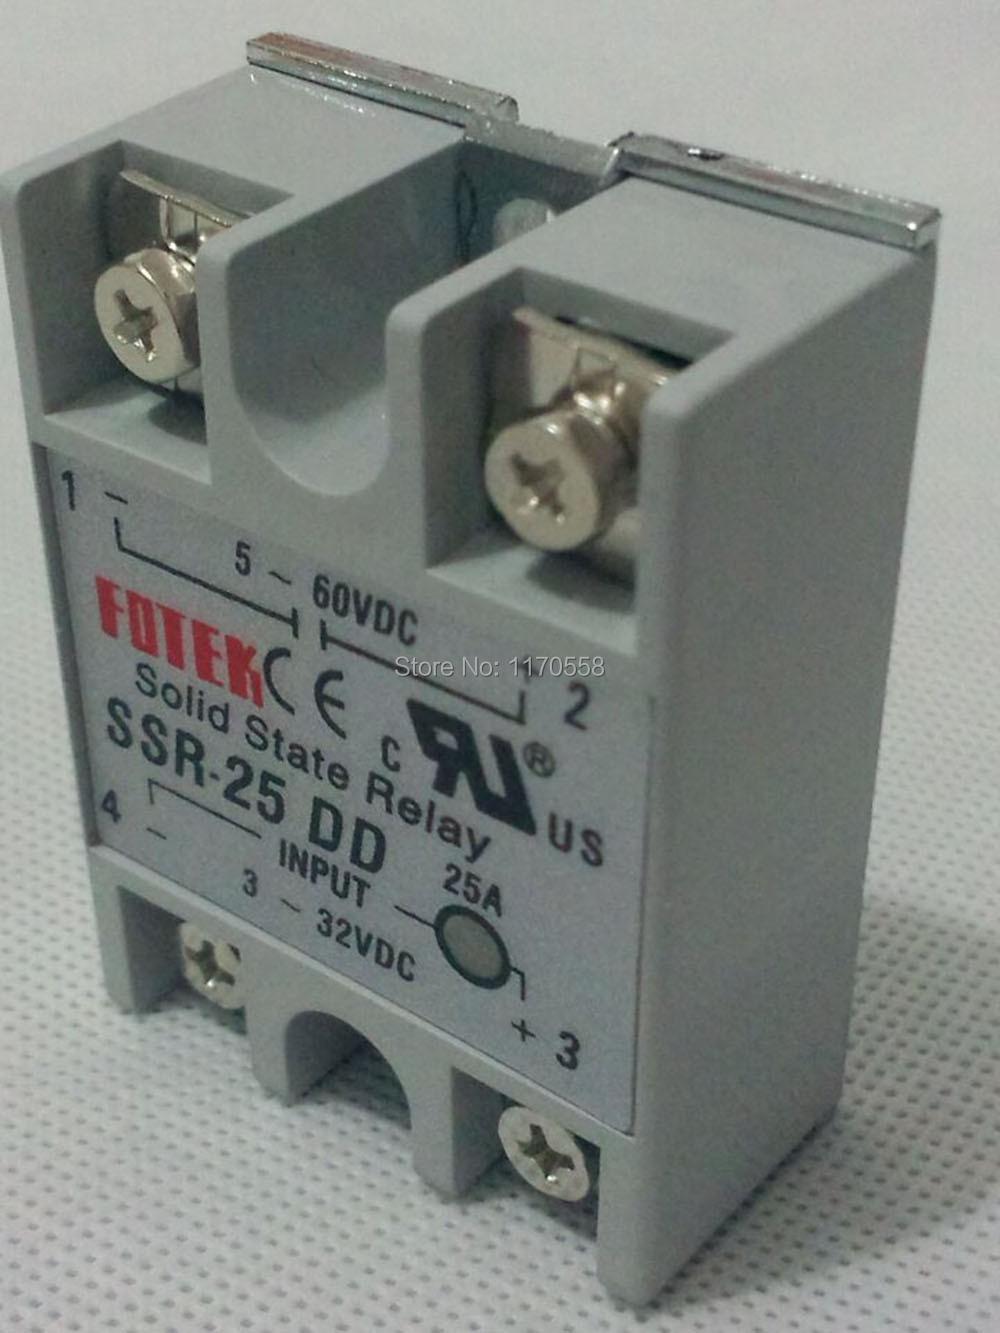 Real 25a Fotek Ssr 25dd Manufacturer Relayinput 3 32vdc Current Input Relay Output 5 60vdc